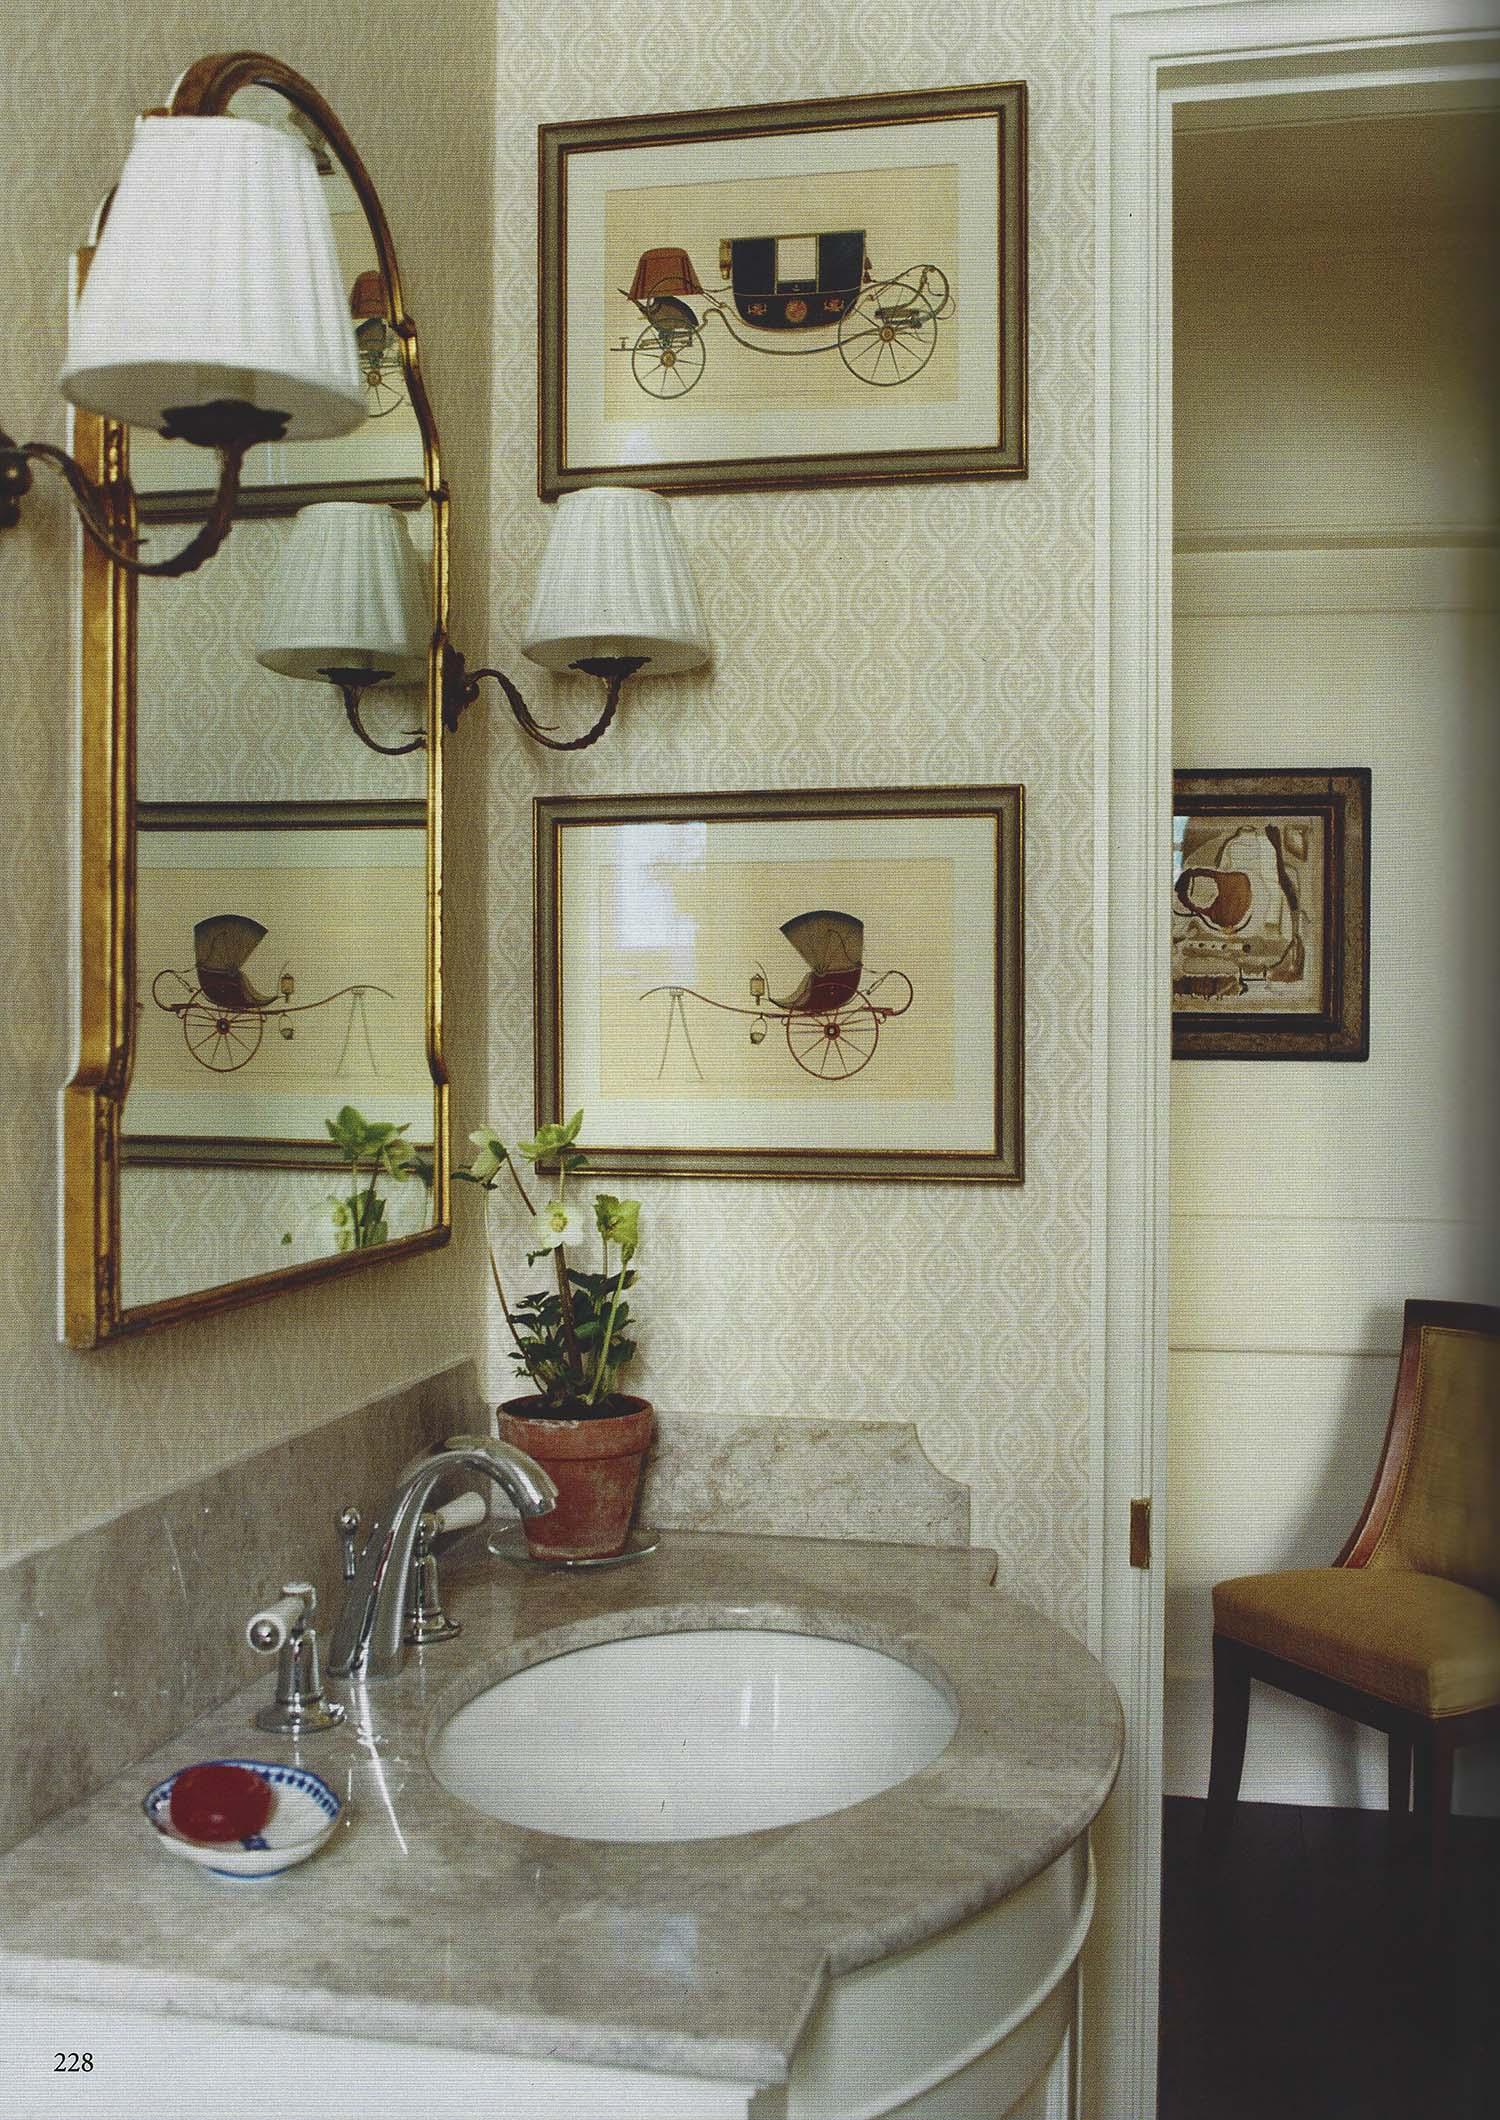 Update Press Page - The World of Interiors - June '16 - 'Cream of Caramel' - Page 228 - Designer - James McWhirter.jpg